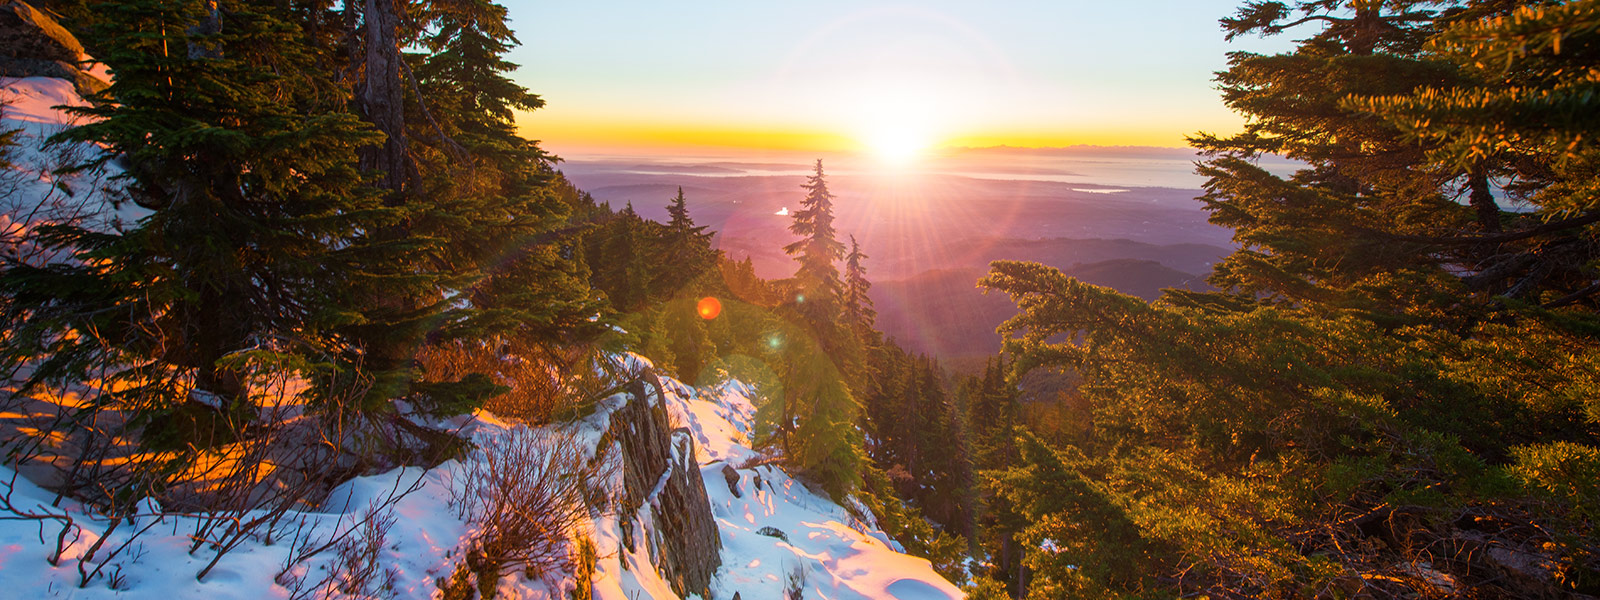 Vacanze in montagna america meta ambita dagli sciatori for Vacanze in montagna